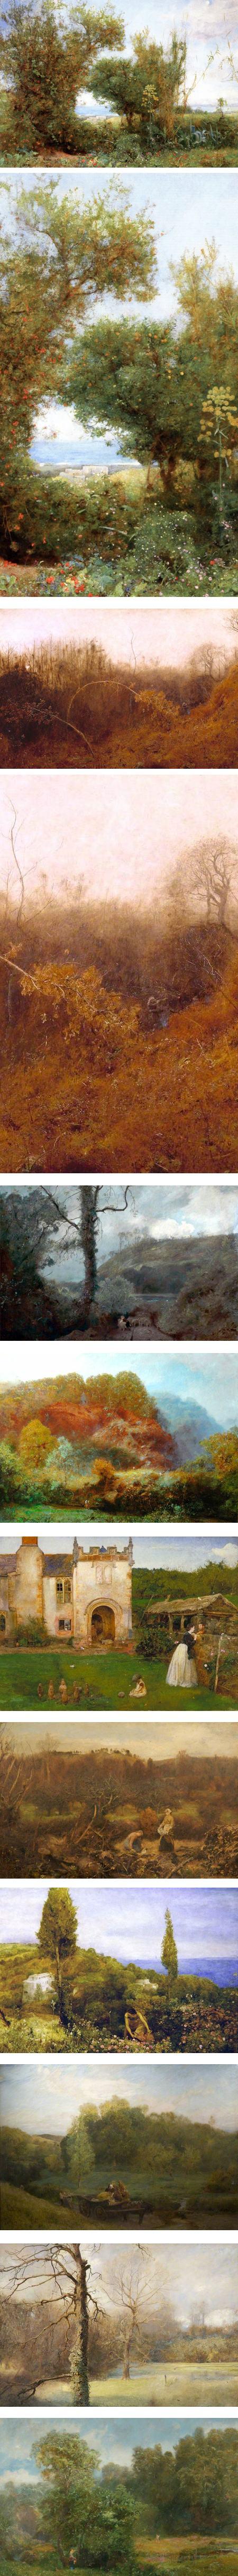 John William North, Victorian painter